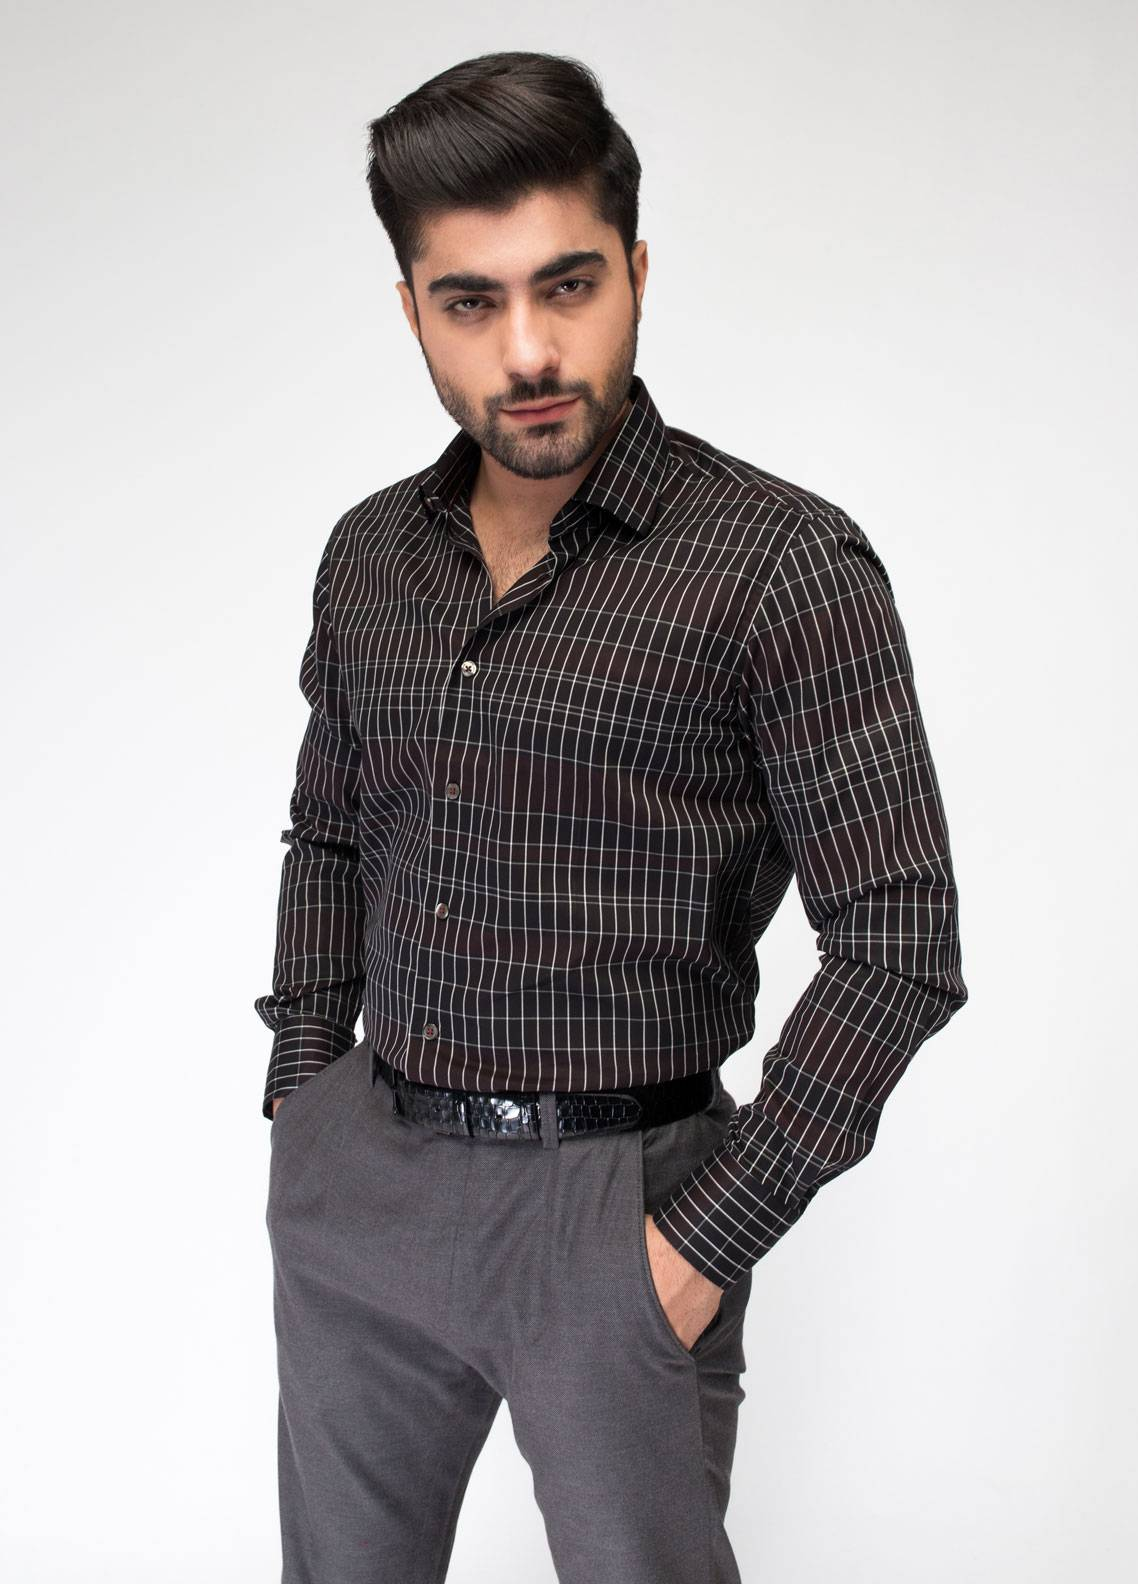 Brumano Cotton Formal Shirts for Men - Black BRM-787